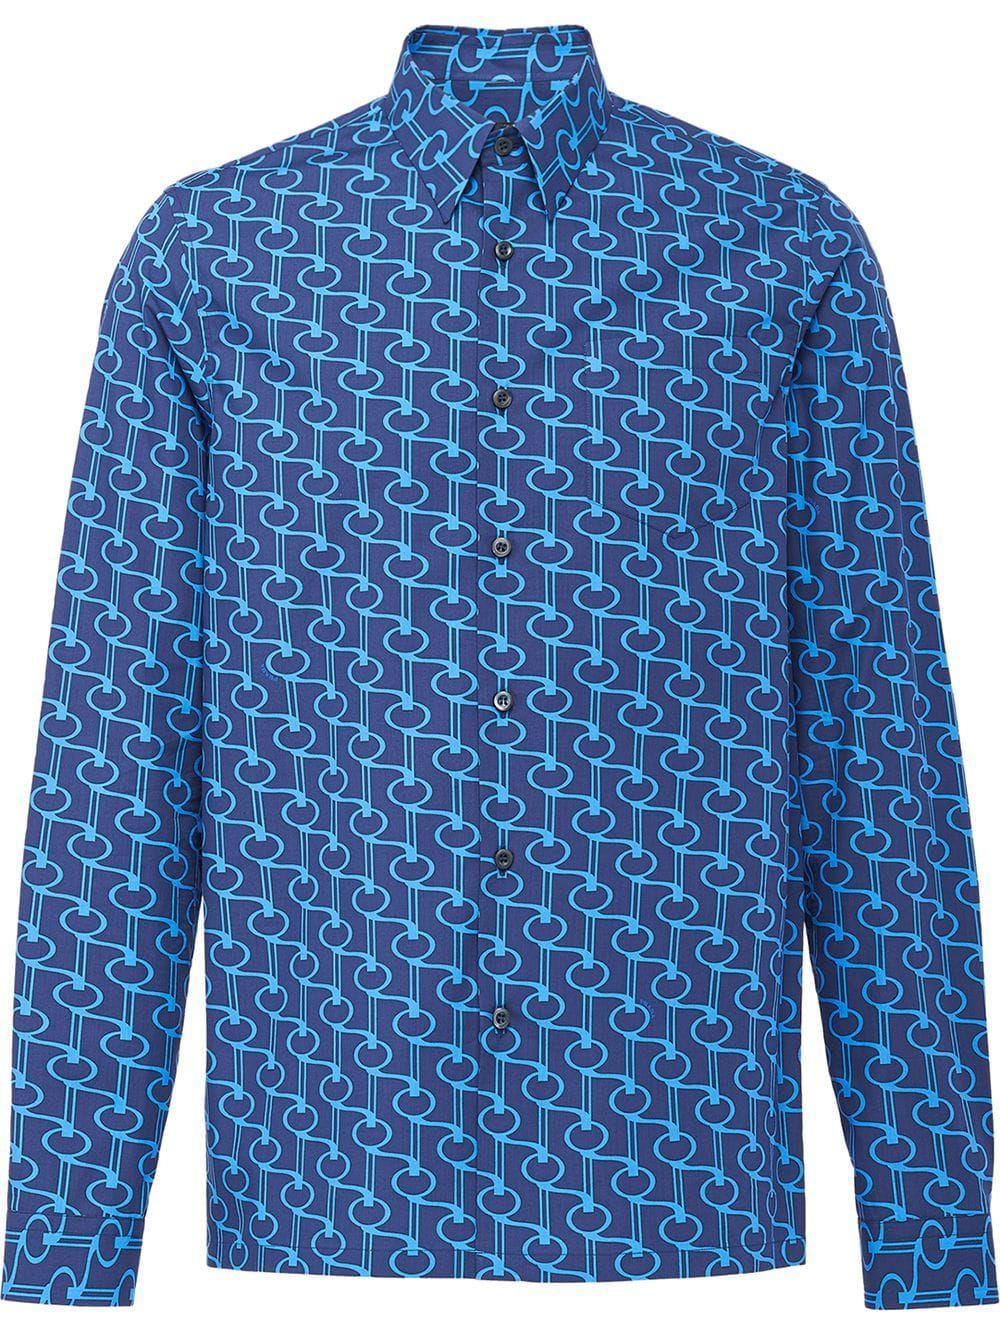 25c6460e80 Prada Poplin shirt with key print - Blue in 2019   Products   Shirts ...